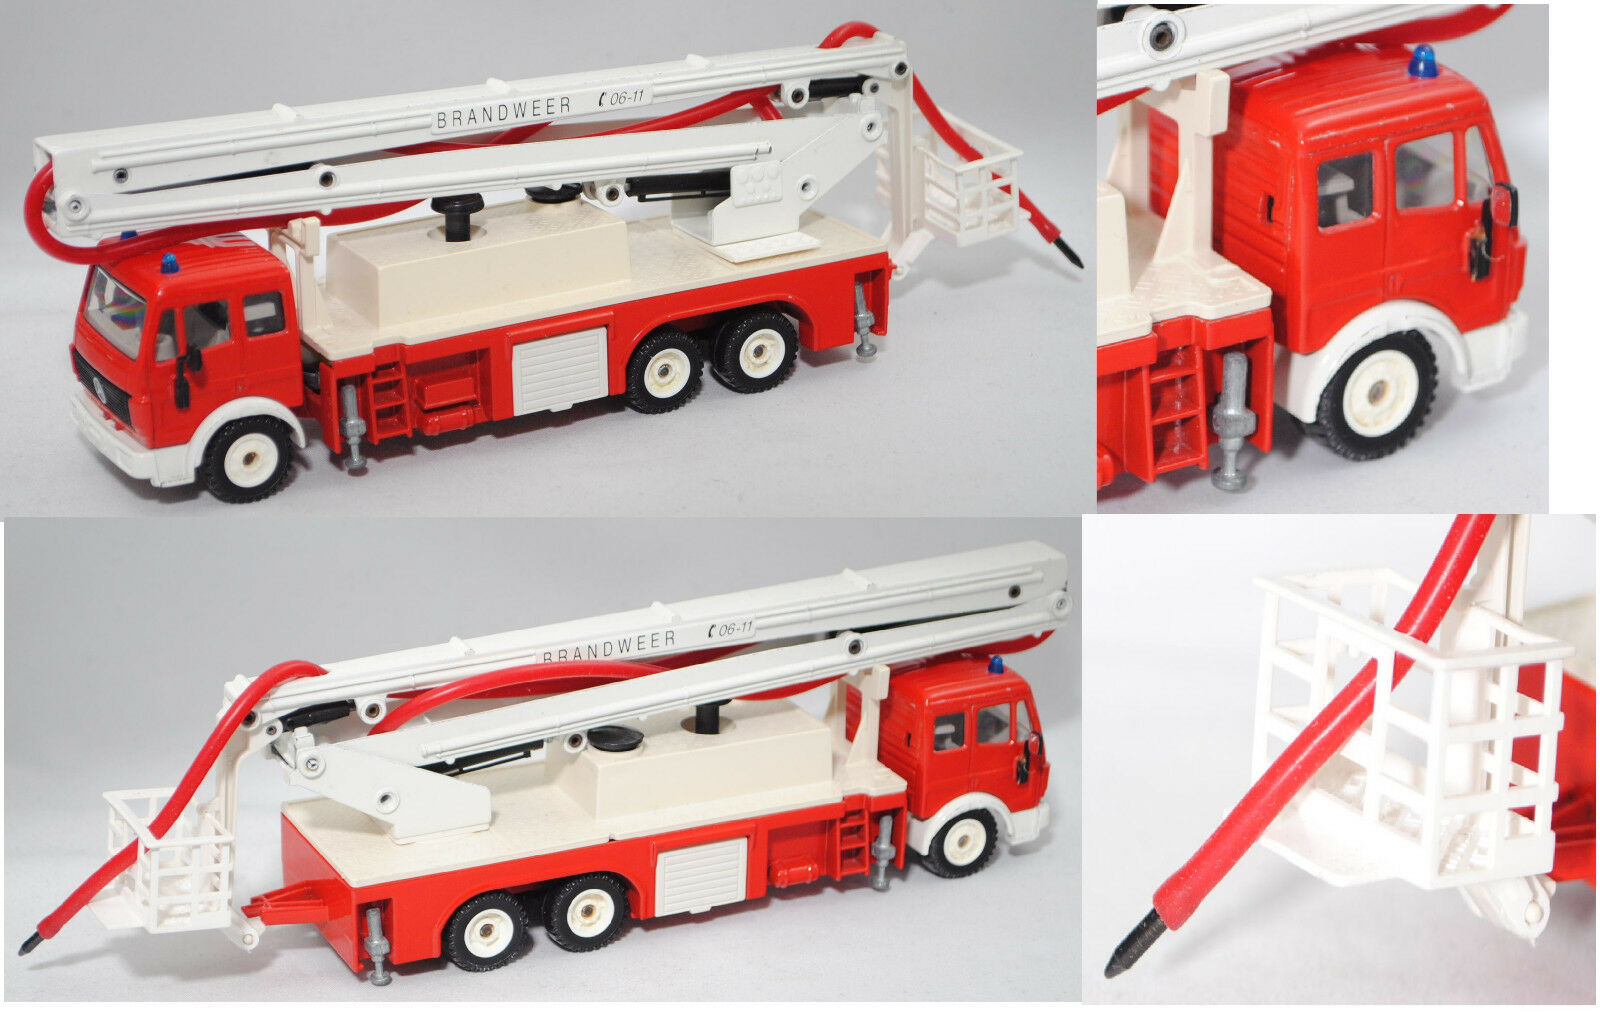 Siku Super 3720 00300 NL Mercedes SK Feuerwehr mit Gelenkarmb 65533;65533;hne BRANDWEER